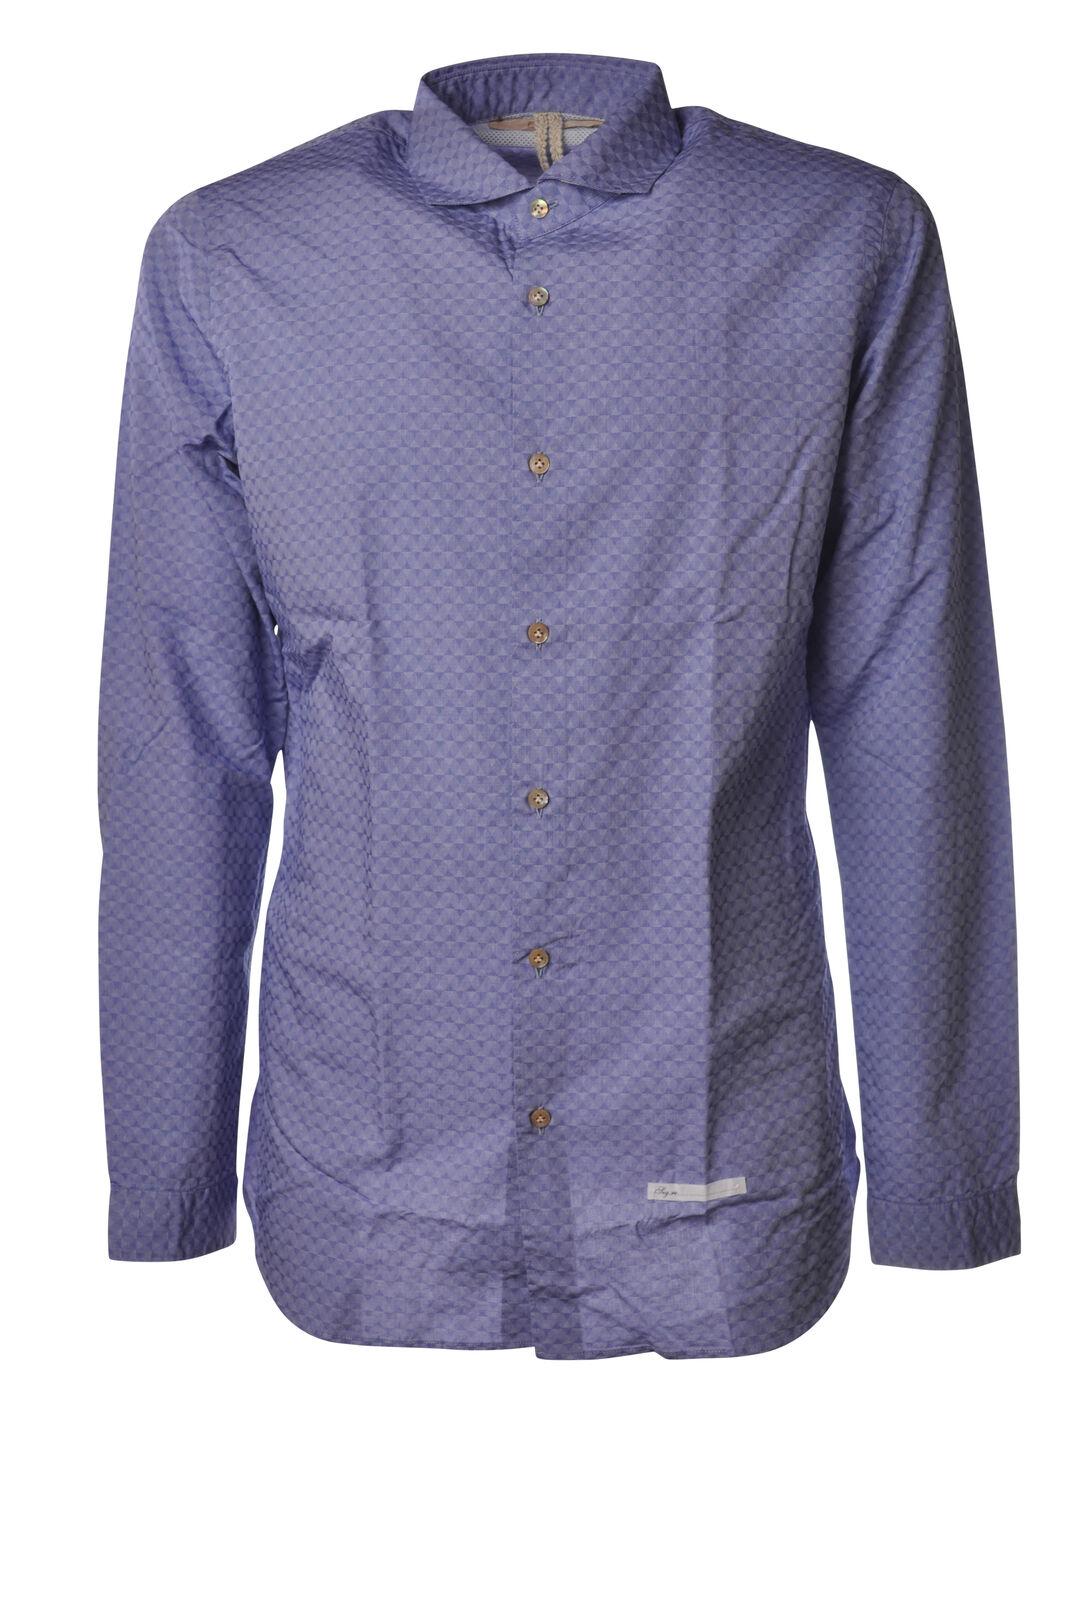 Dnl - Shirts-Shirt - Man - Blau - 5254818D181500